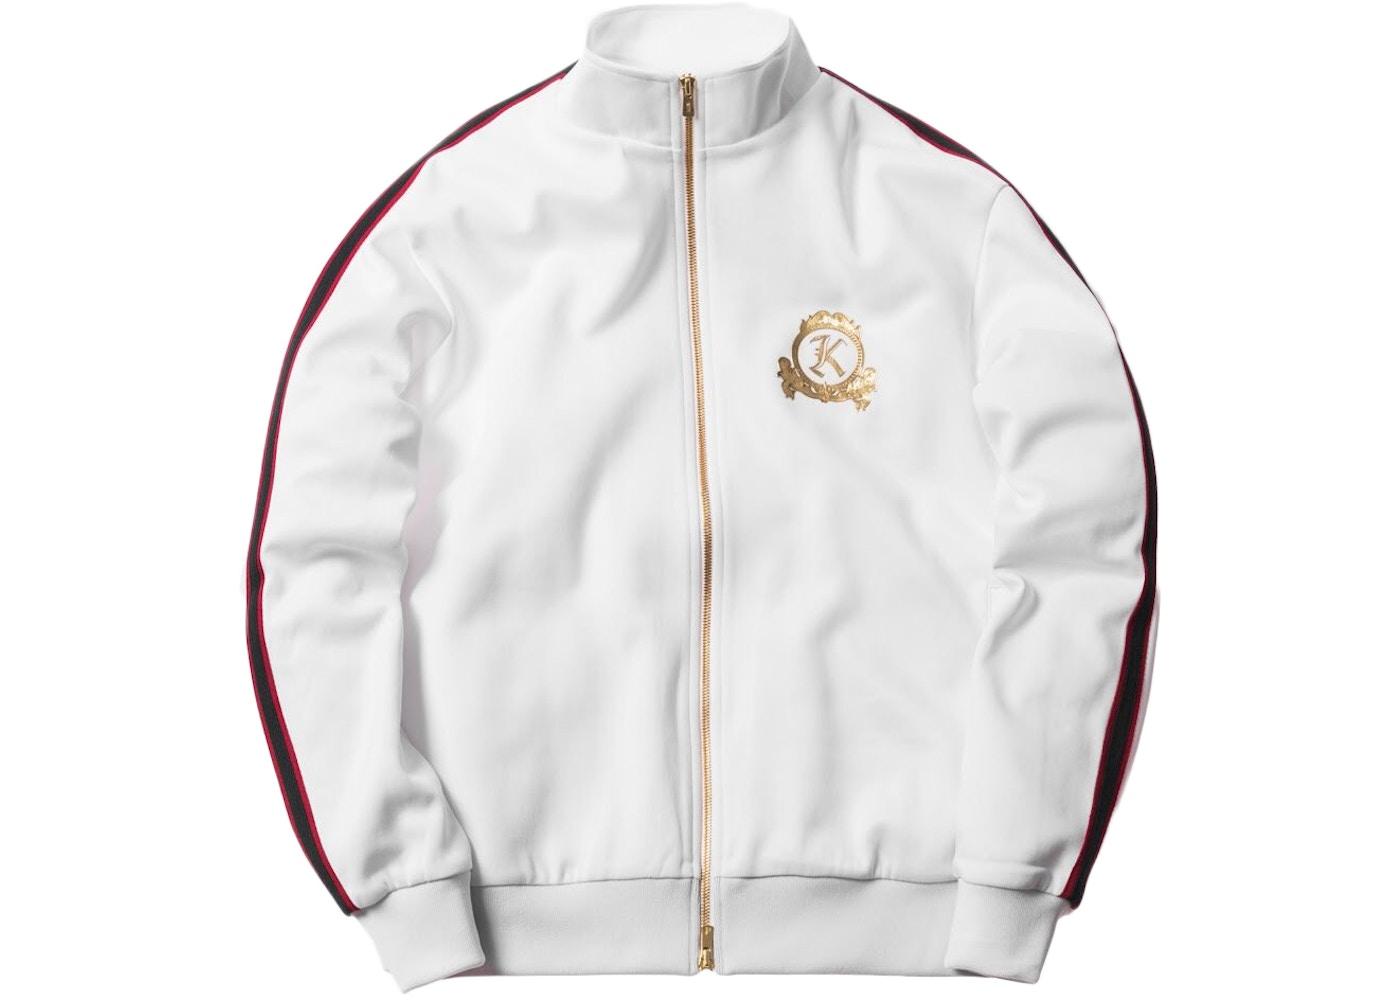 b74fa873ef09b Streetwear - Kith Jackets - Lowest Ask